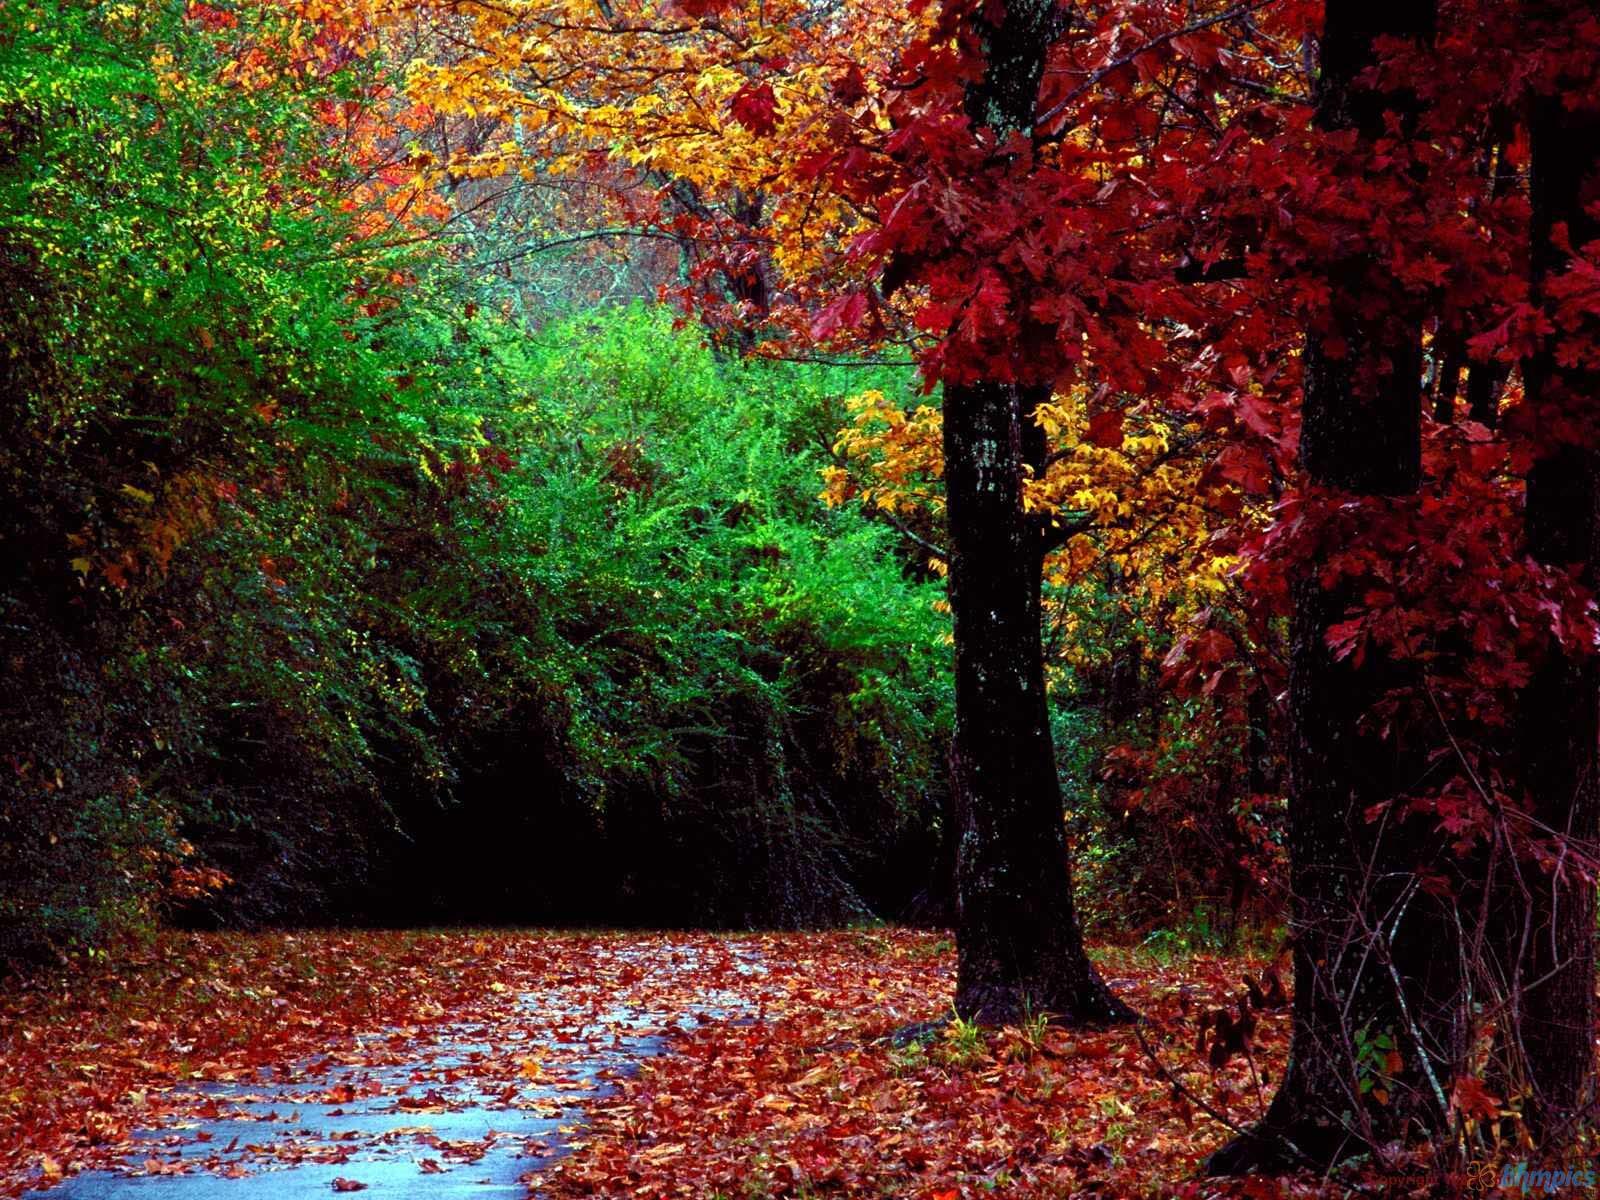 Hình nền mùa thu Autumnforestandlandscap